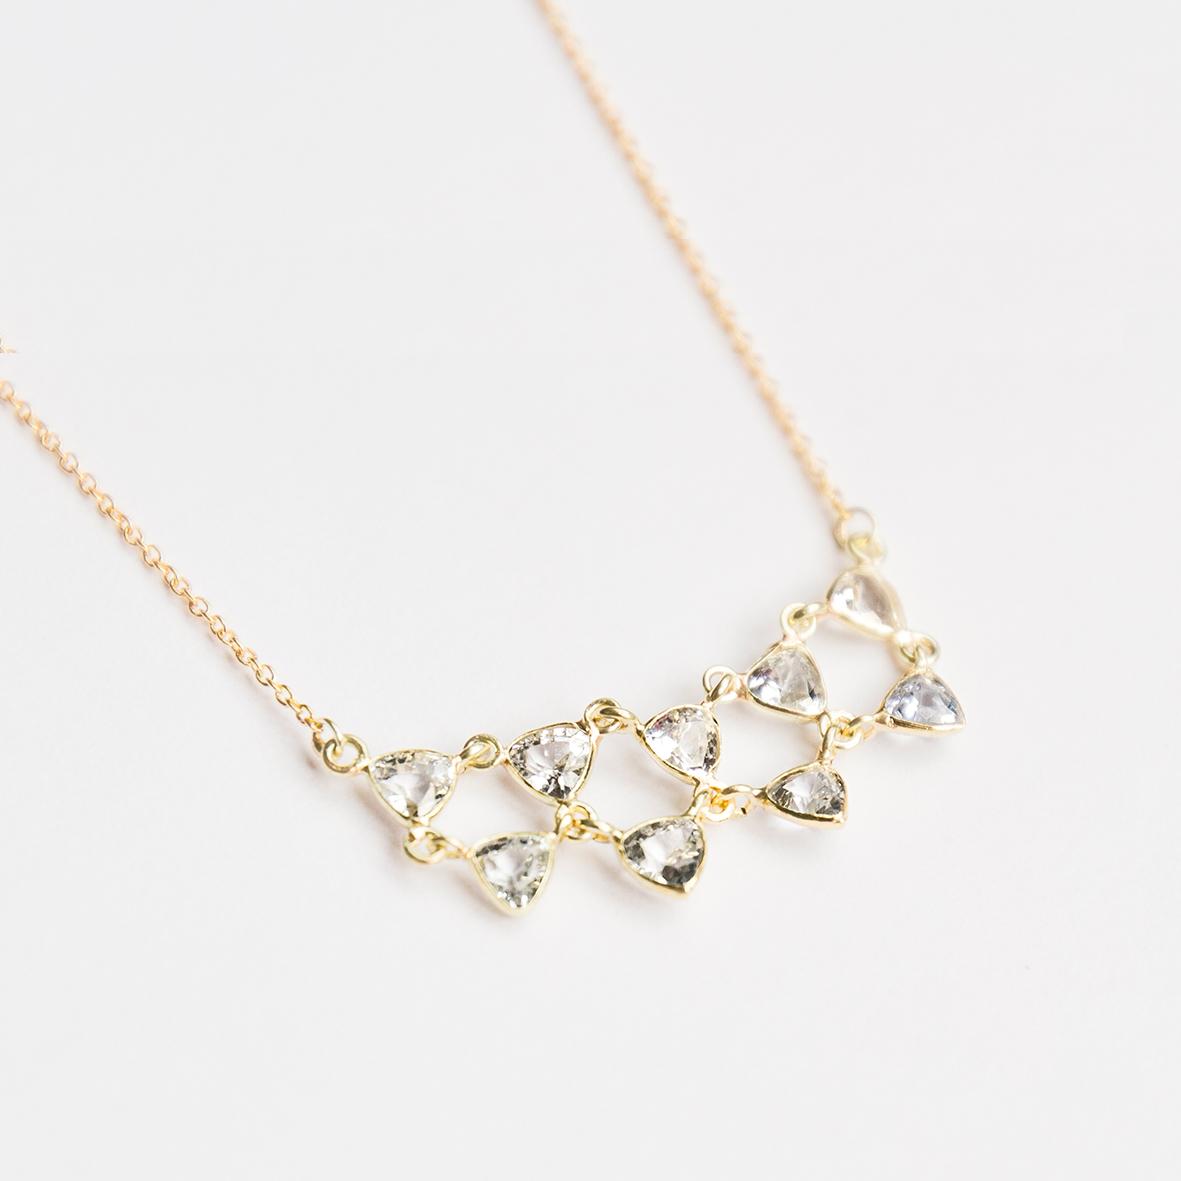 4. OONA_philo_principal_sapphire triangles net necklace